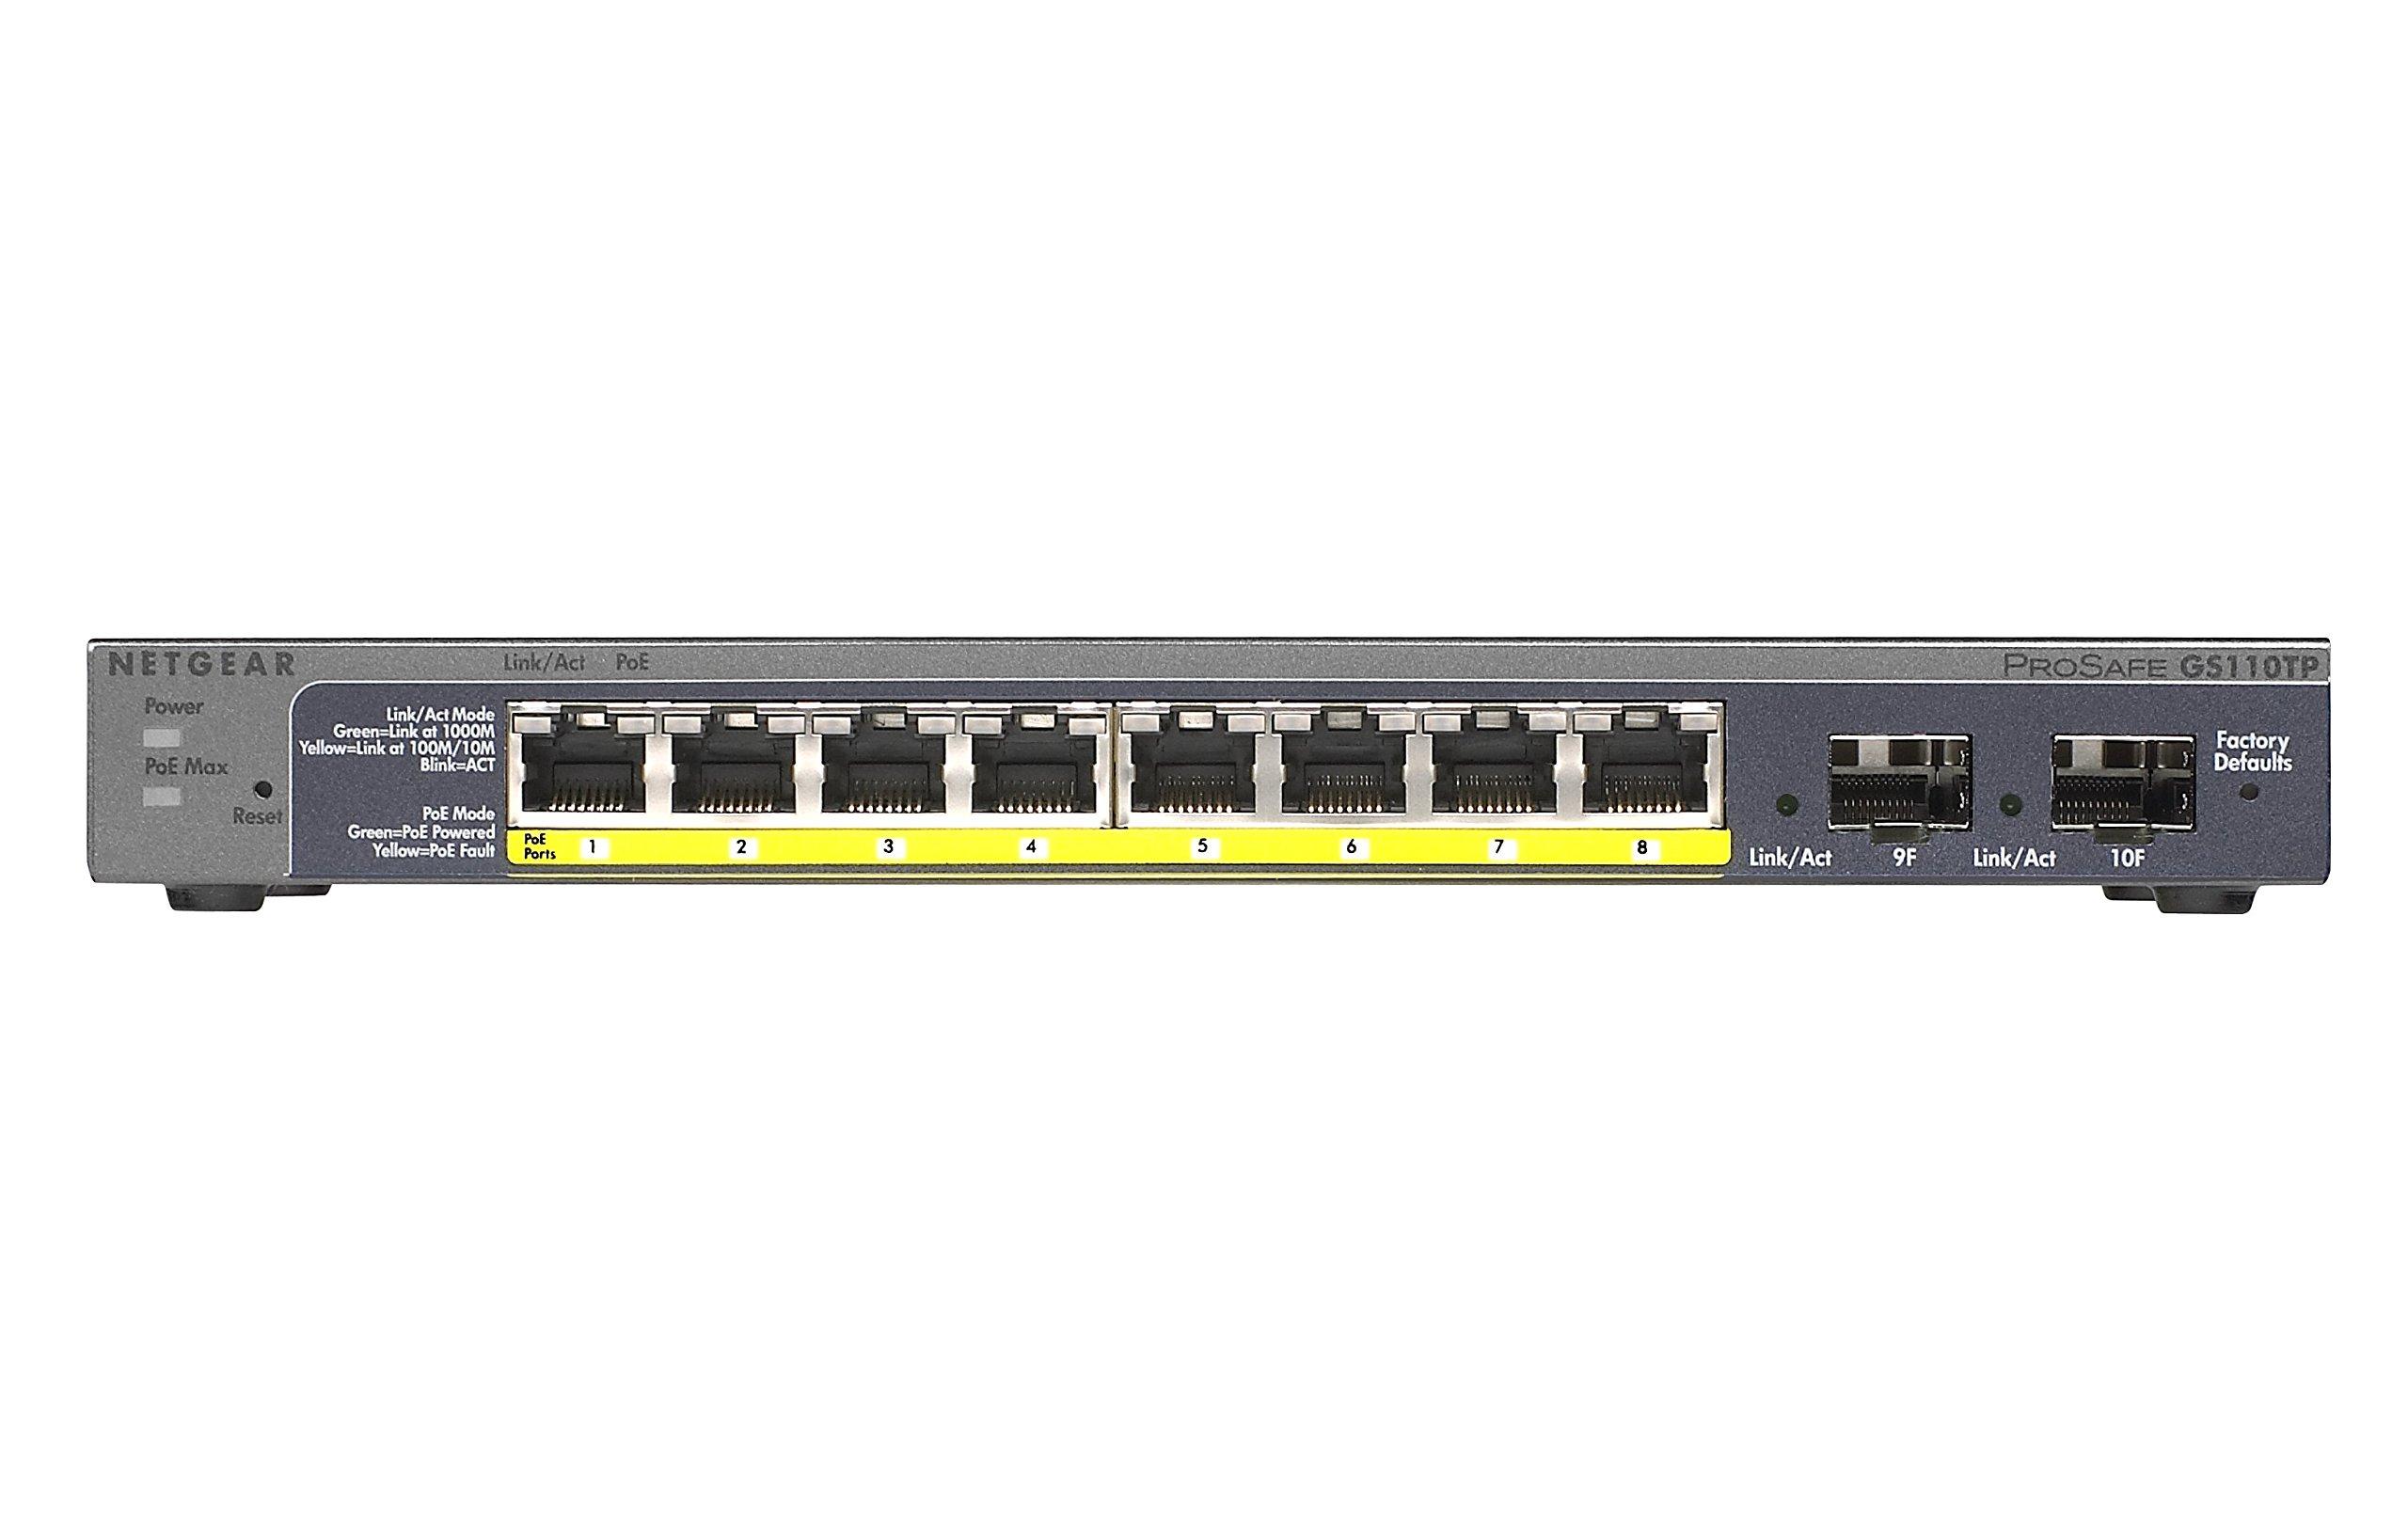 NETGEAR 8-Port Gigabit Smart Managed Pro Switch, 53w, PoE, ProSAFE Lifetime Protection (GS110TPv2) by NETGEAR (Image #2)